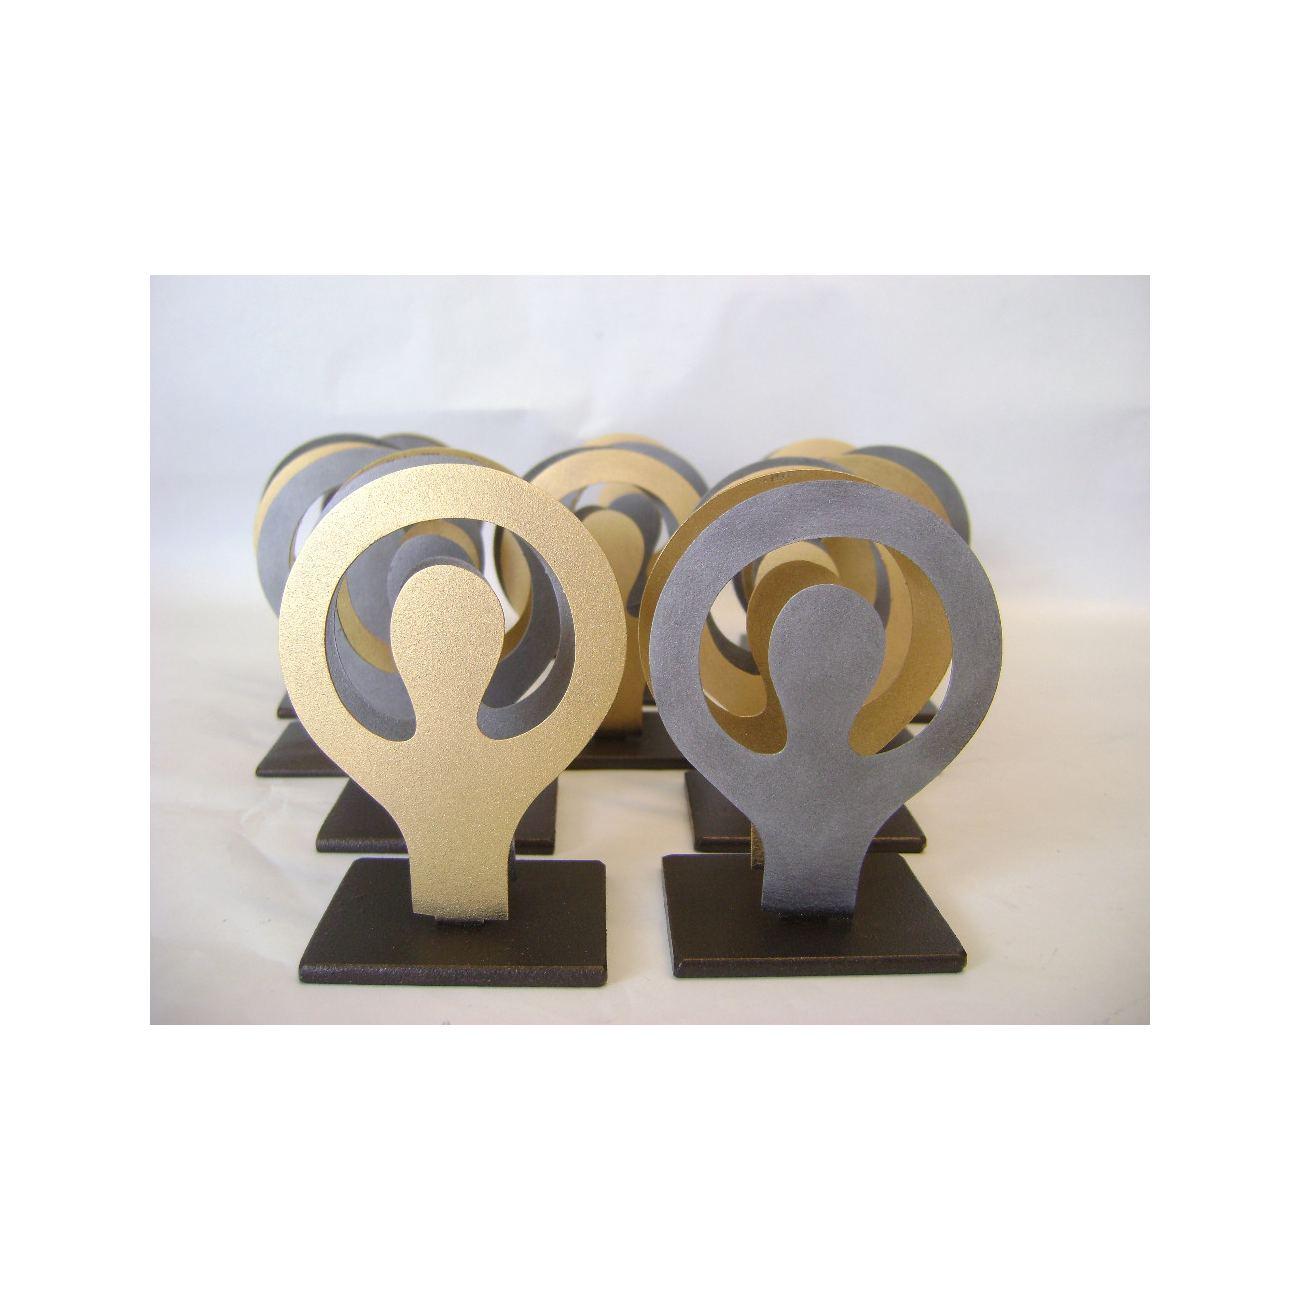 Card Holder, Modern Metal, Handmade Human Figure Design